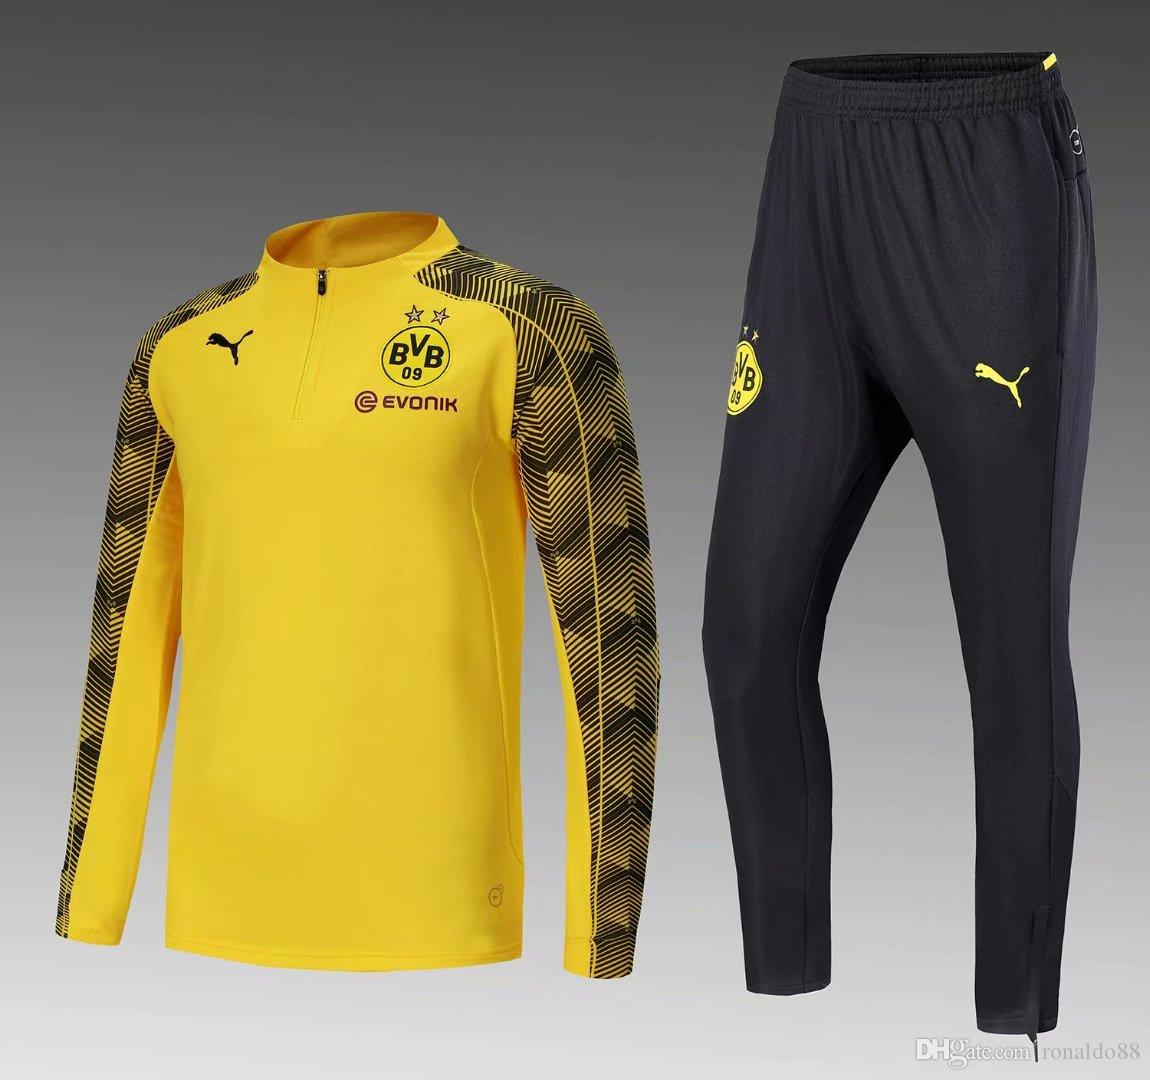 63c449fcb 2019 New 18 19 Season Dortmund Jacket Gomez 2018 2019 Home Away Tracksuits  Soccer Jersey Gotze Training Suit From Ronaldo88, $42.61 | DHgate.Com